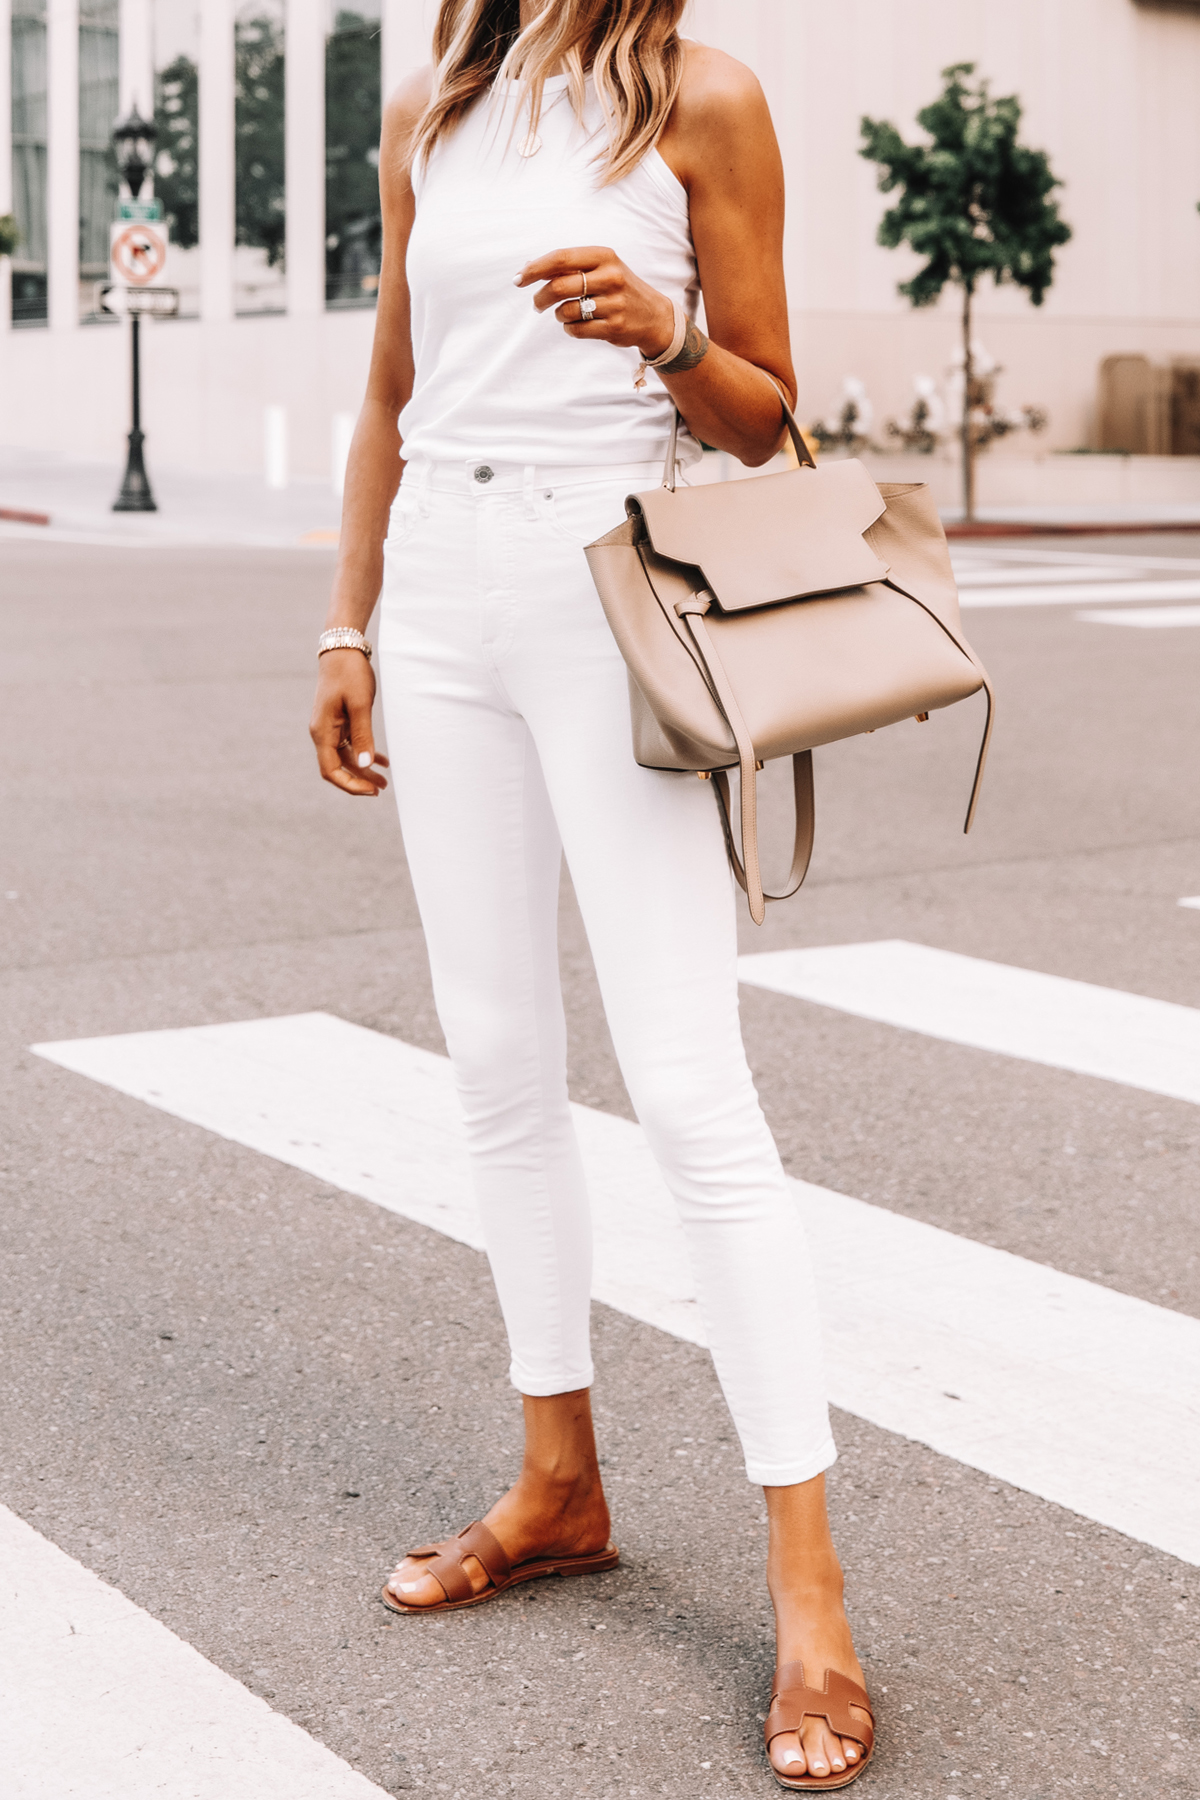 Fashion Jackson Wearing Everlane White The Organic Cotton Cutaway Tank Everlane White Skinny Jeans Hermes Sandals